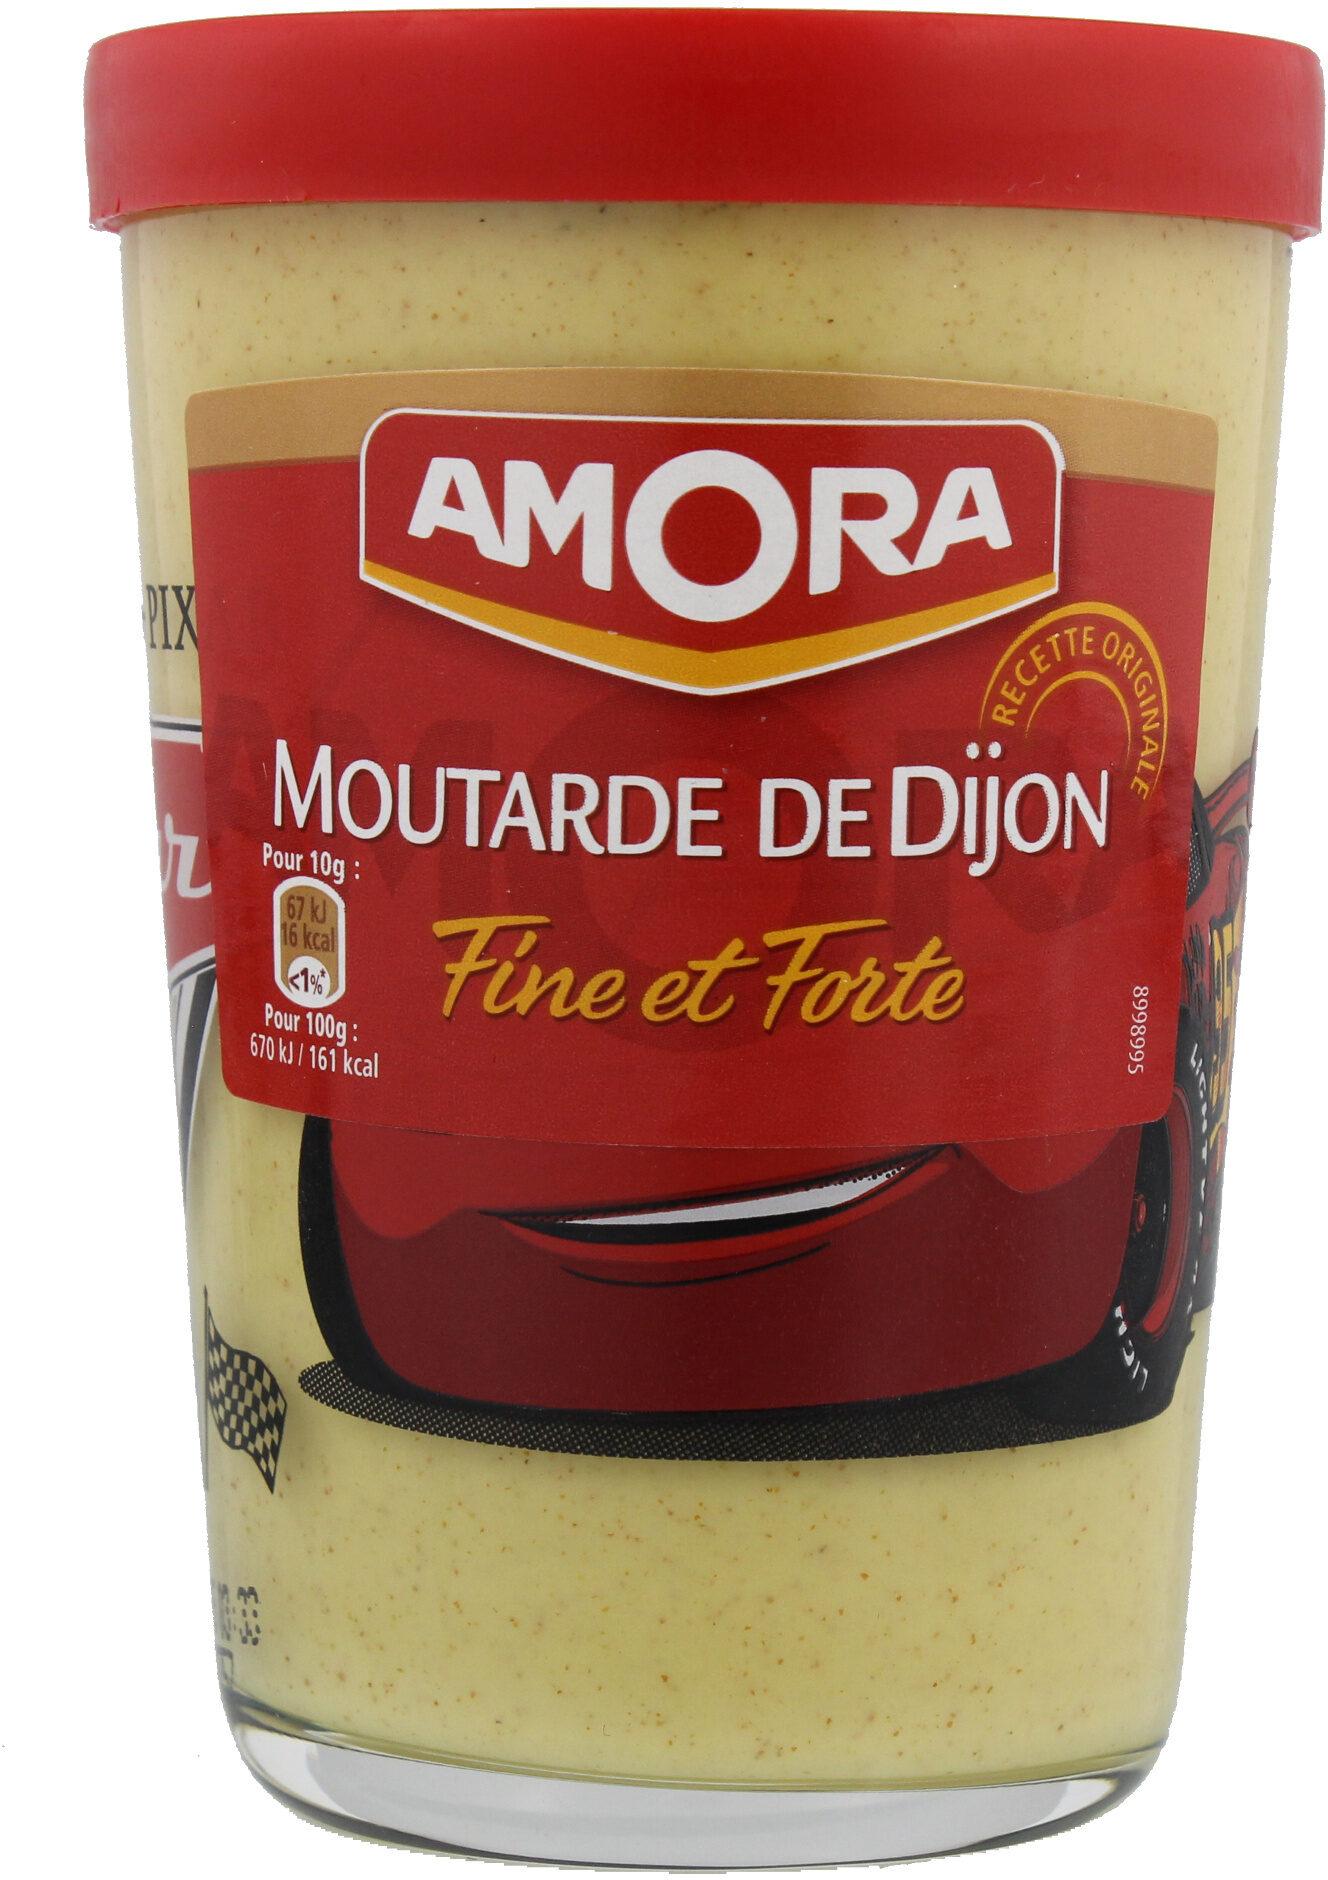 Amora Moutarde de Dijon Fine et Forte Verre Tv 195g - Produit - fr